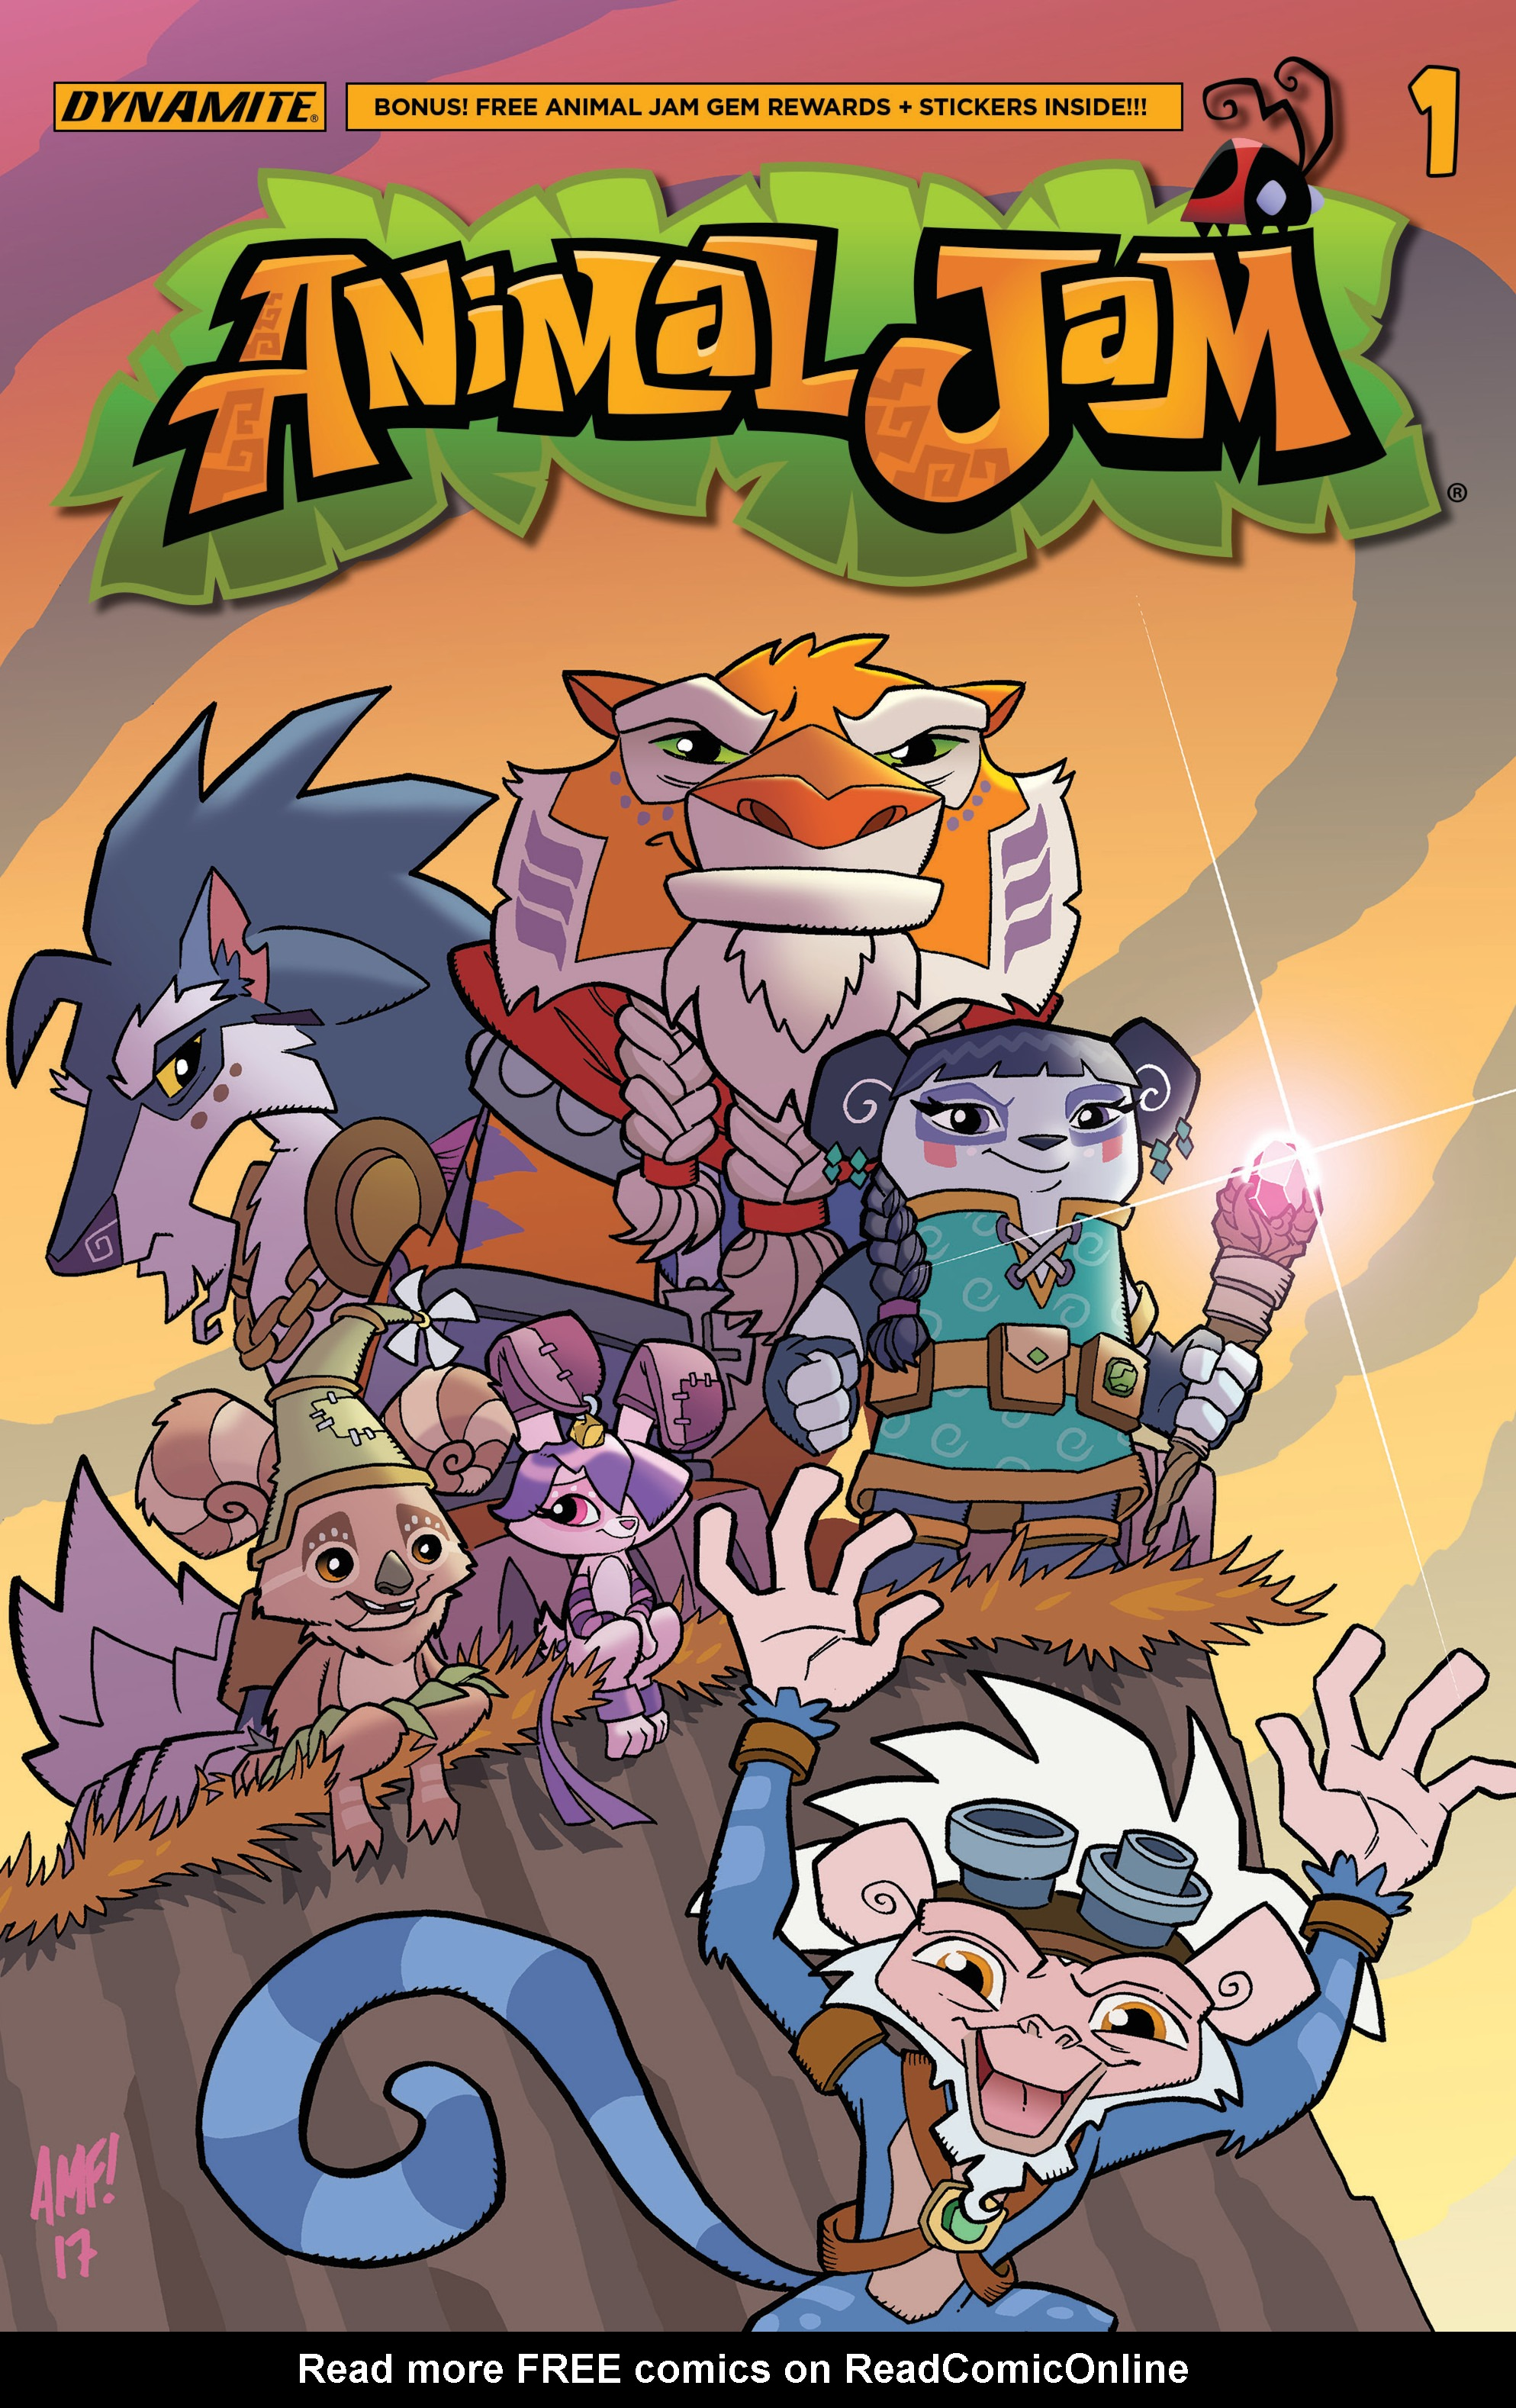 Read online Animal Jam comic -  Issue #1 - 2